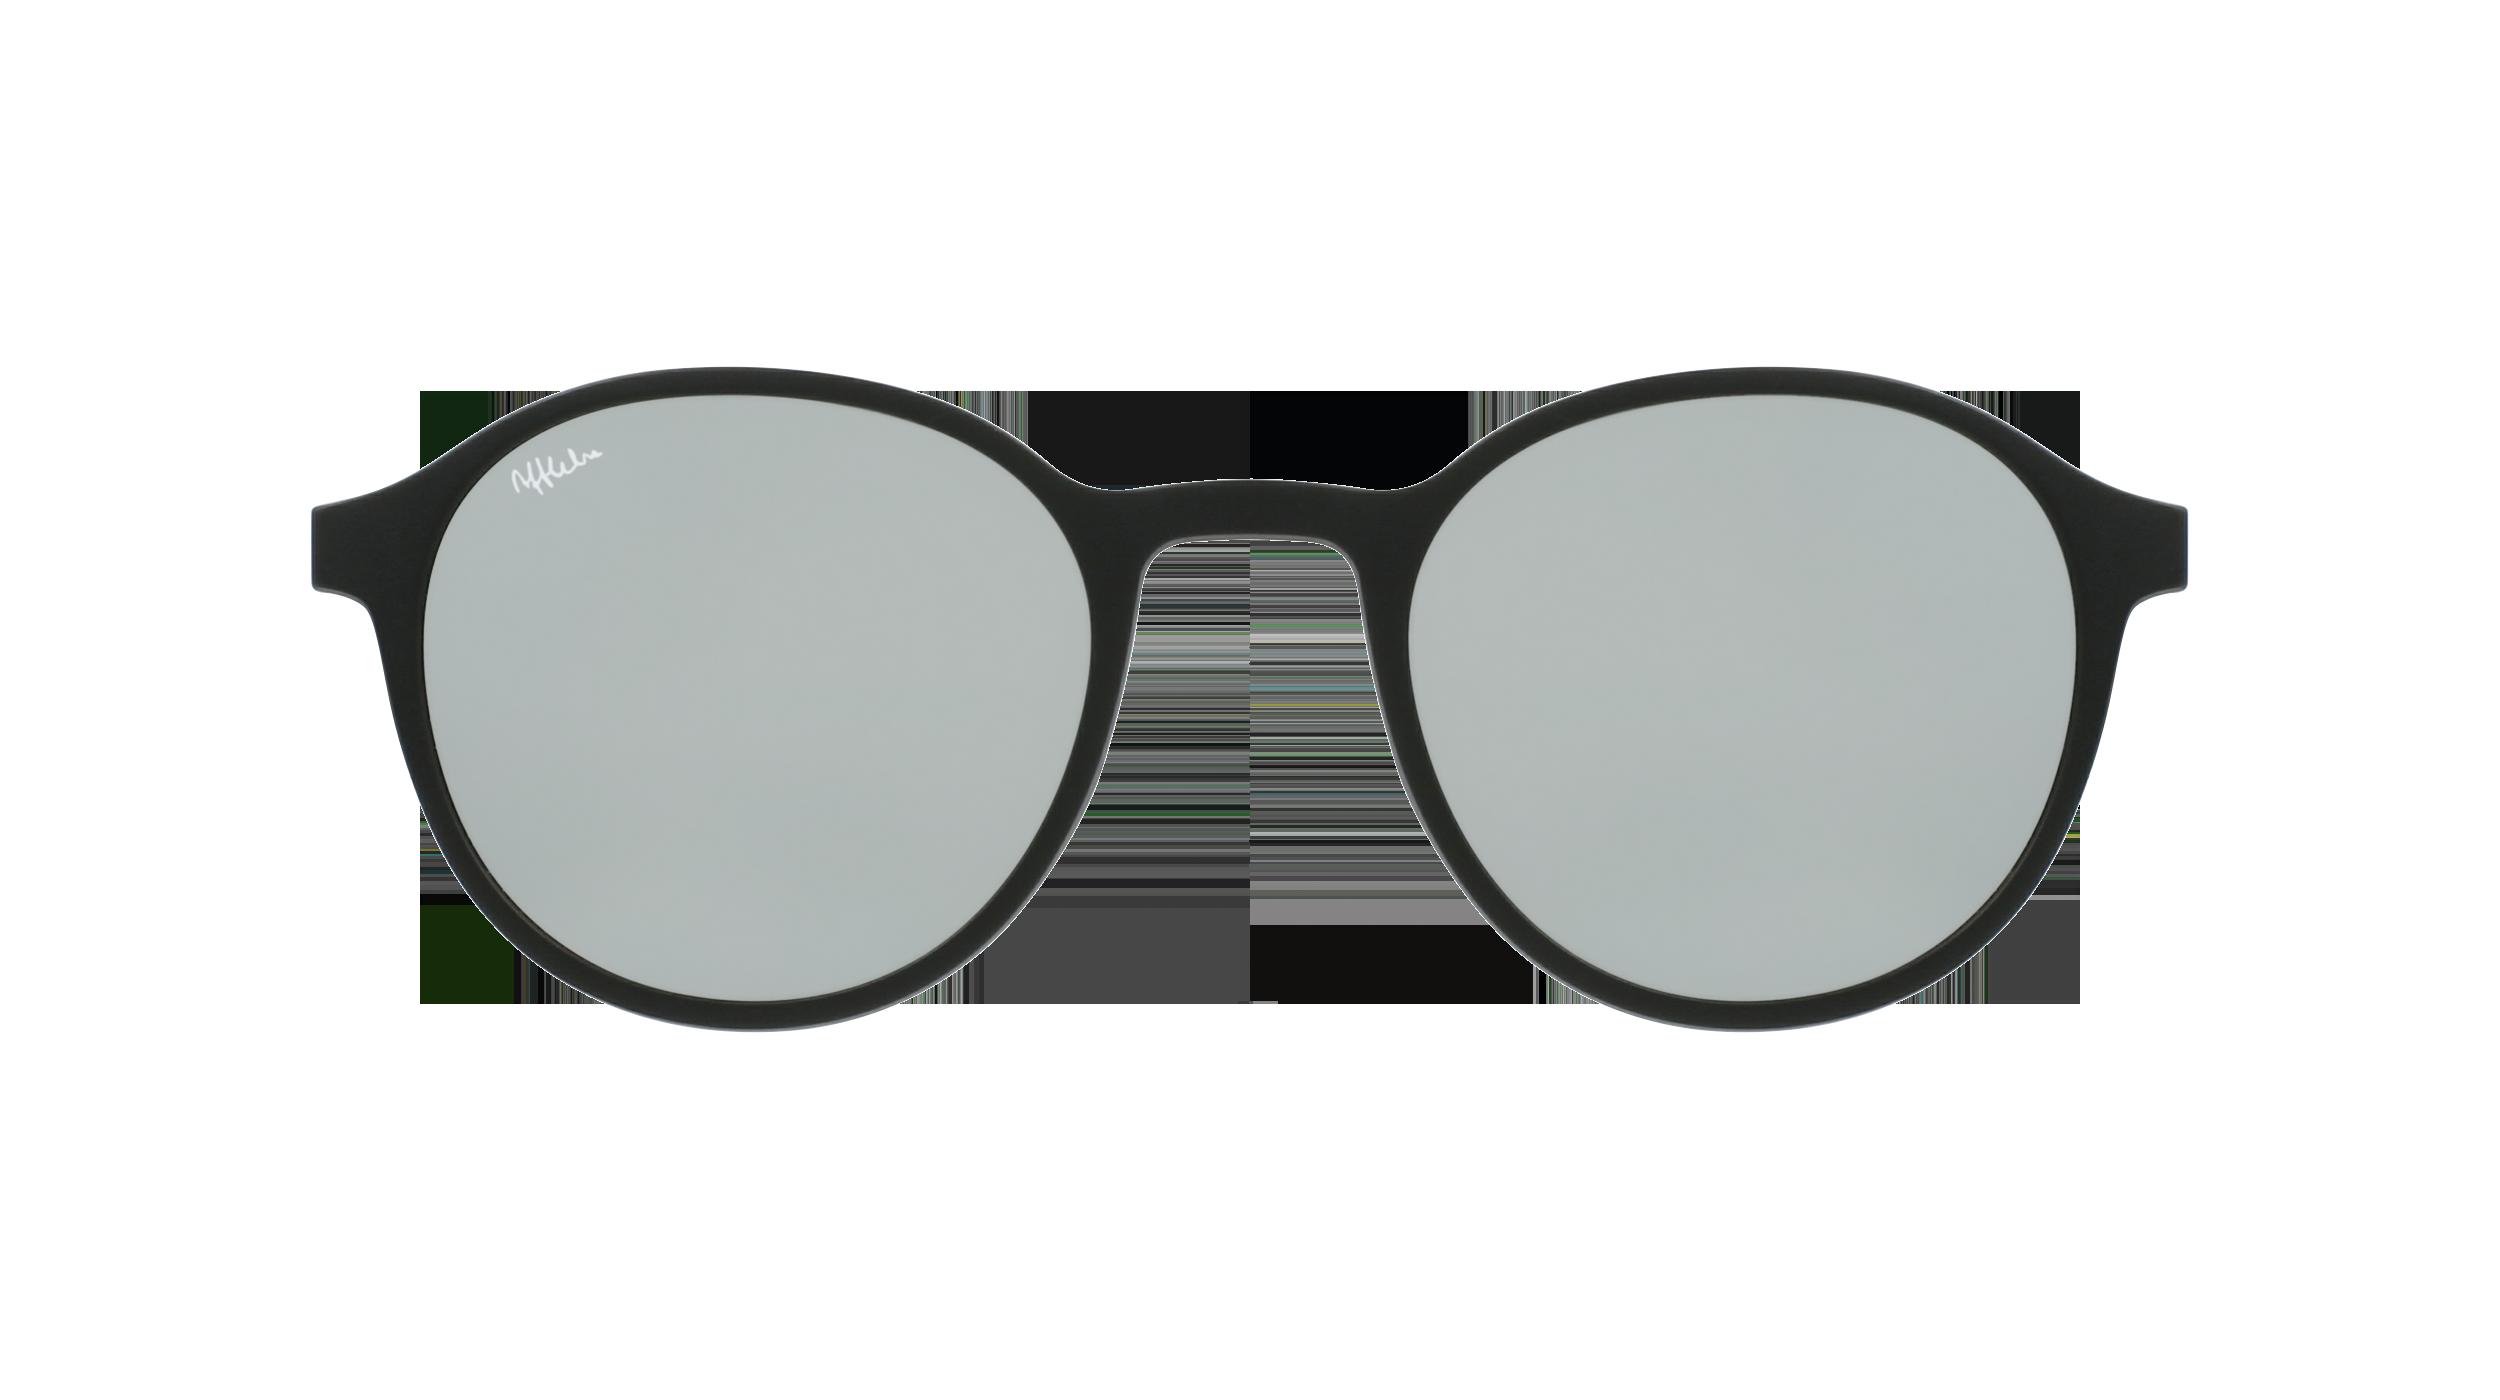 afflelou/france/products/smart_clip/clips_glasses/07630036458853.png